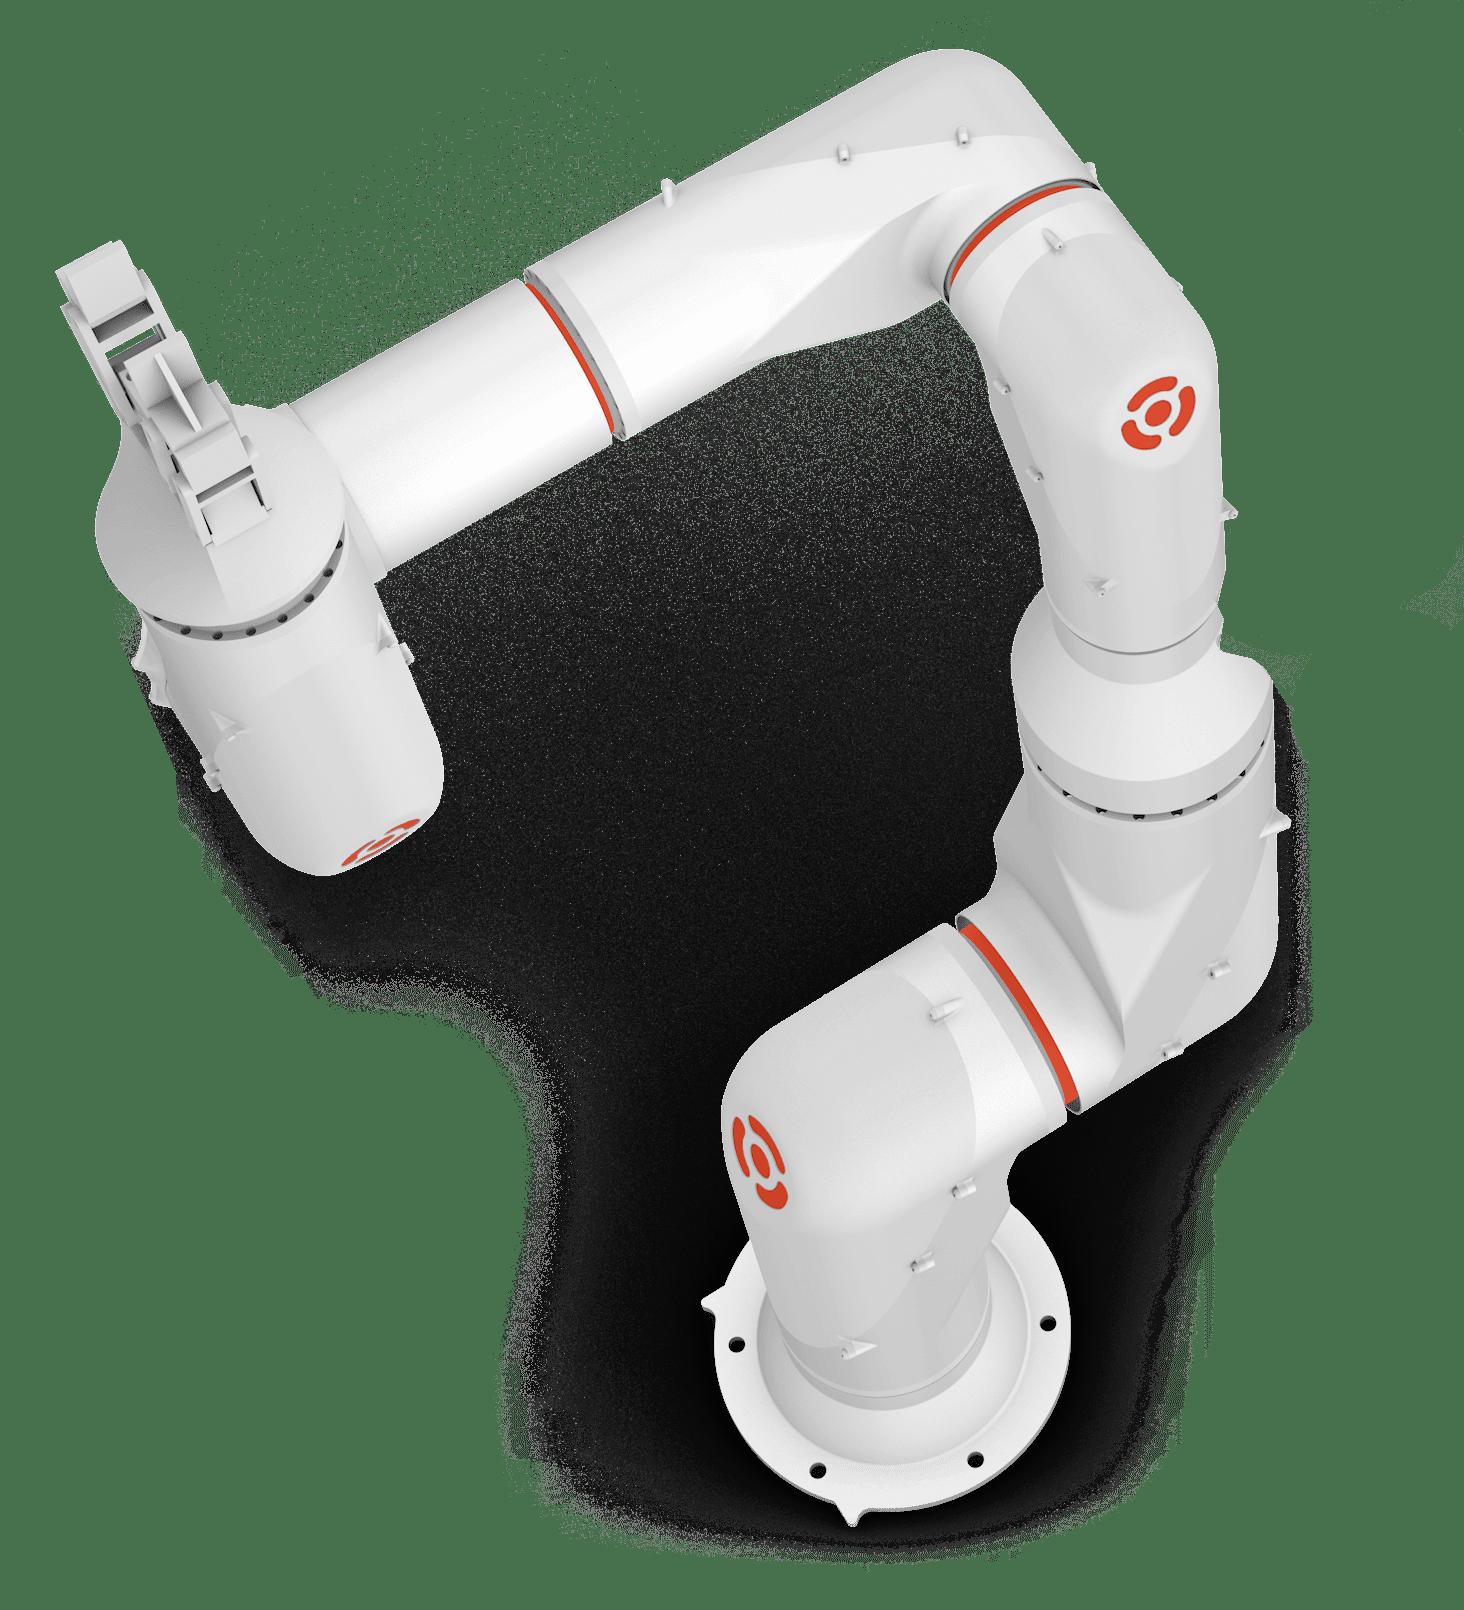 Motiv Space Systems X-link Robotic Arm